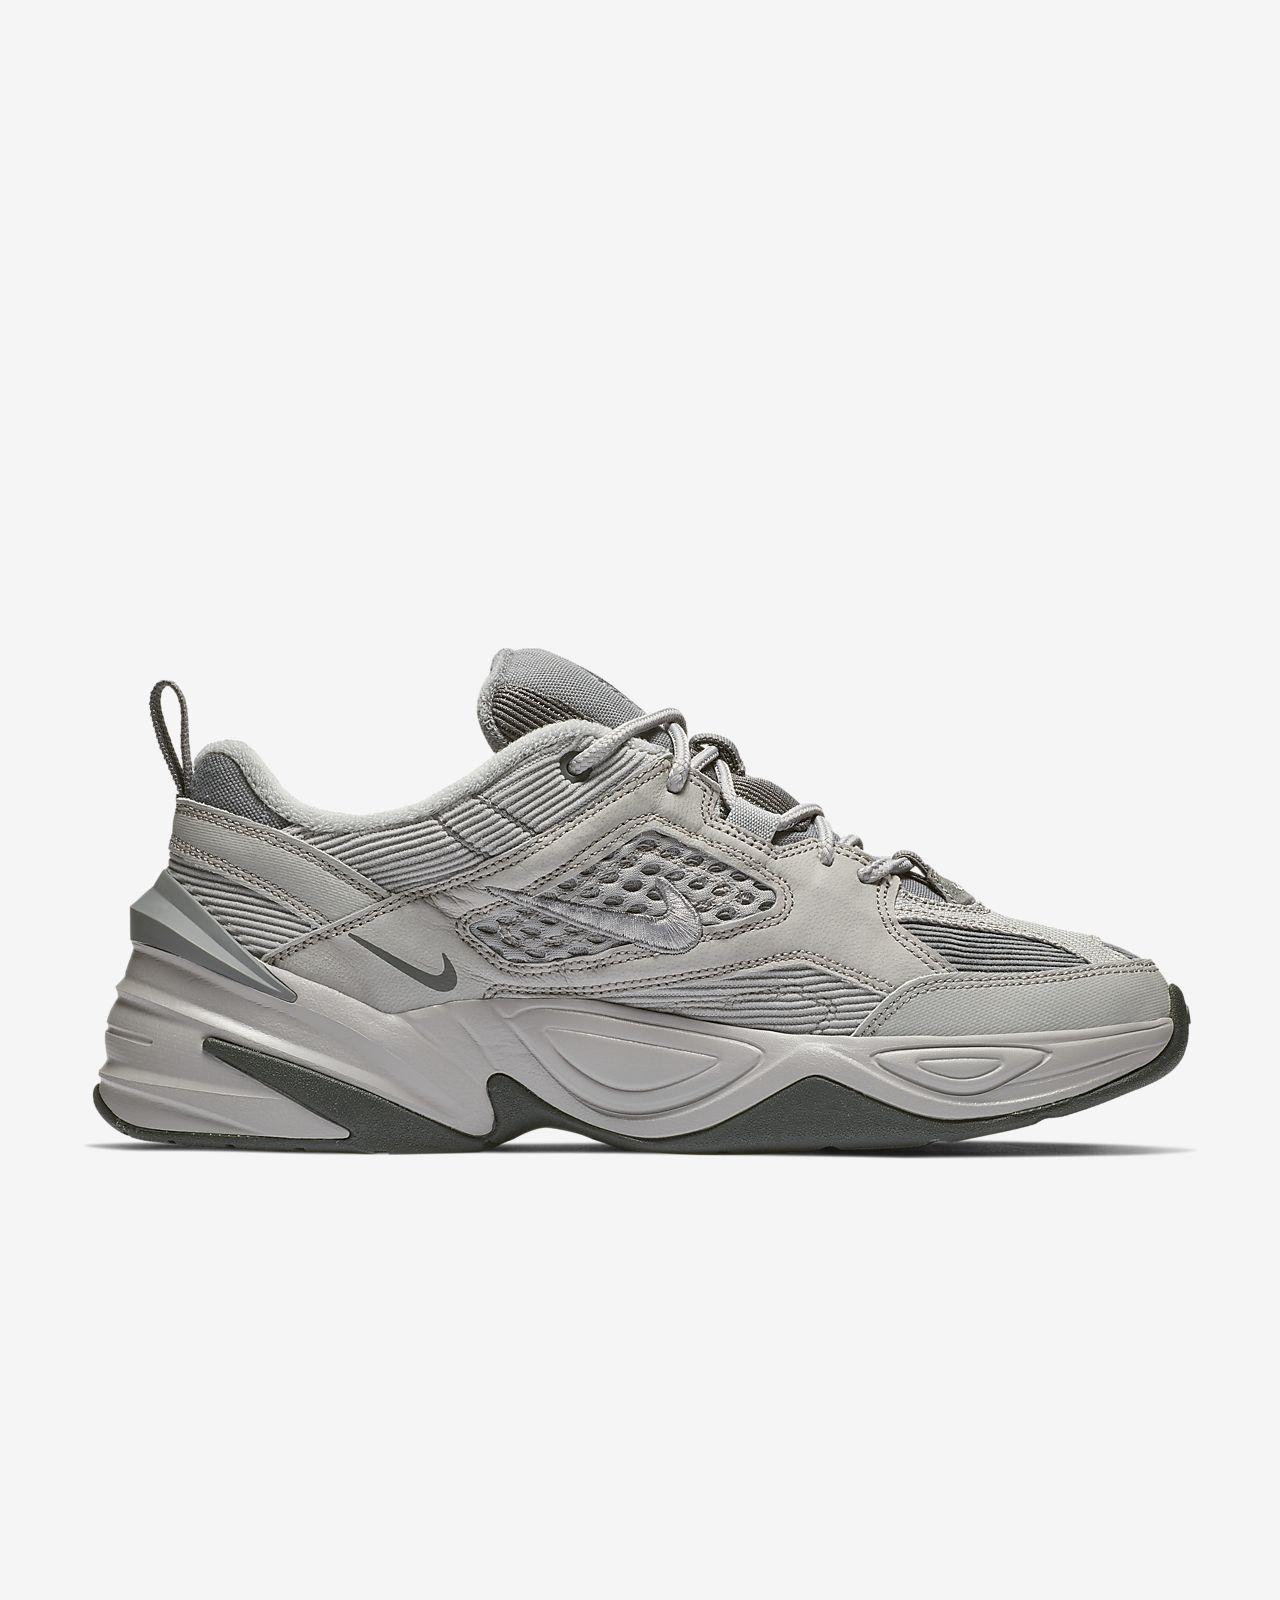 9346d2c07bdc00 Nike M2K Tekno SP Men s Shoe. Nike.com GB